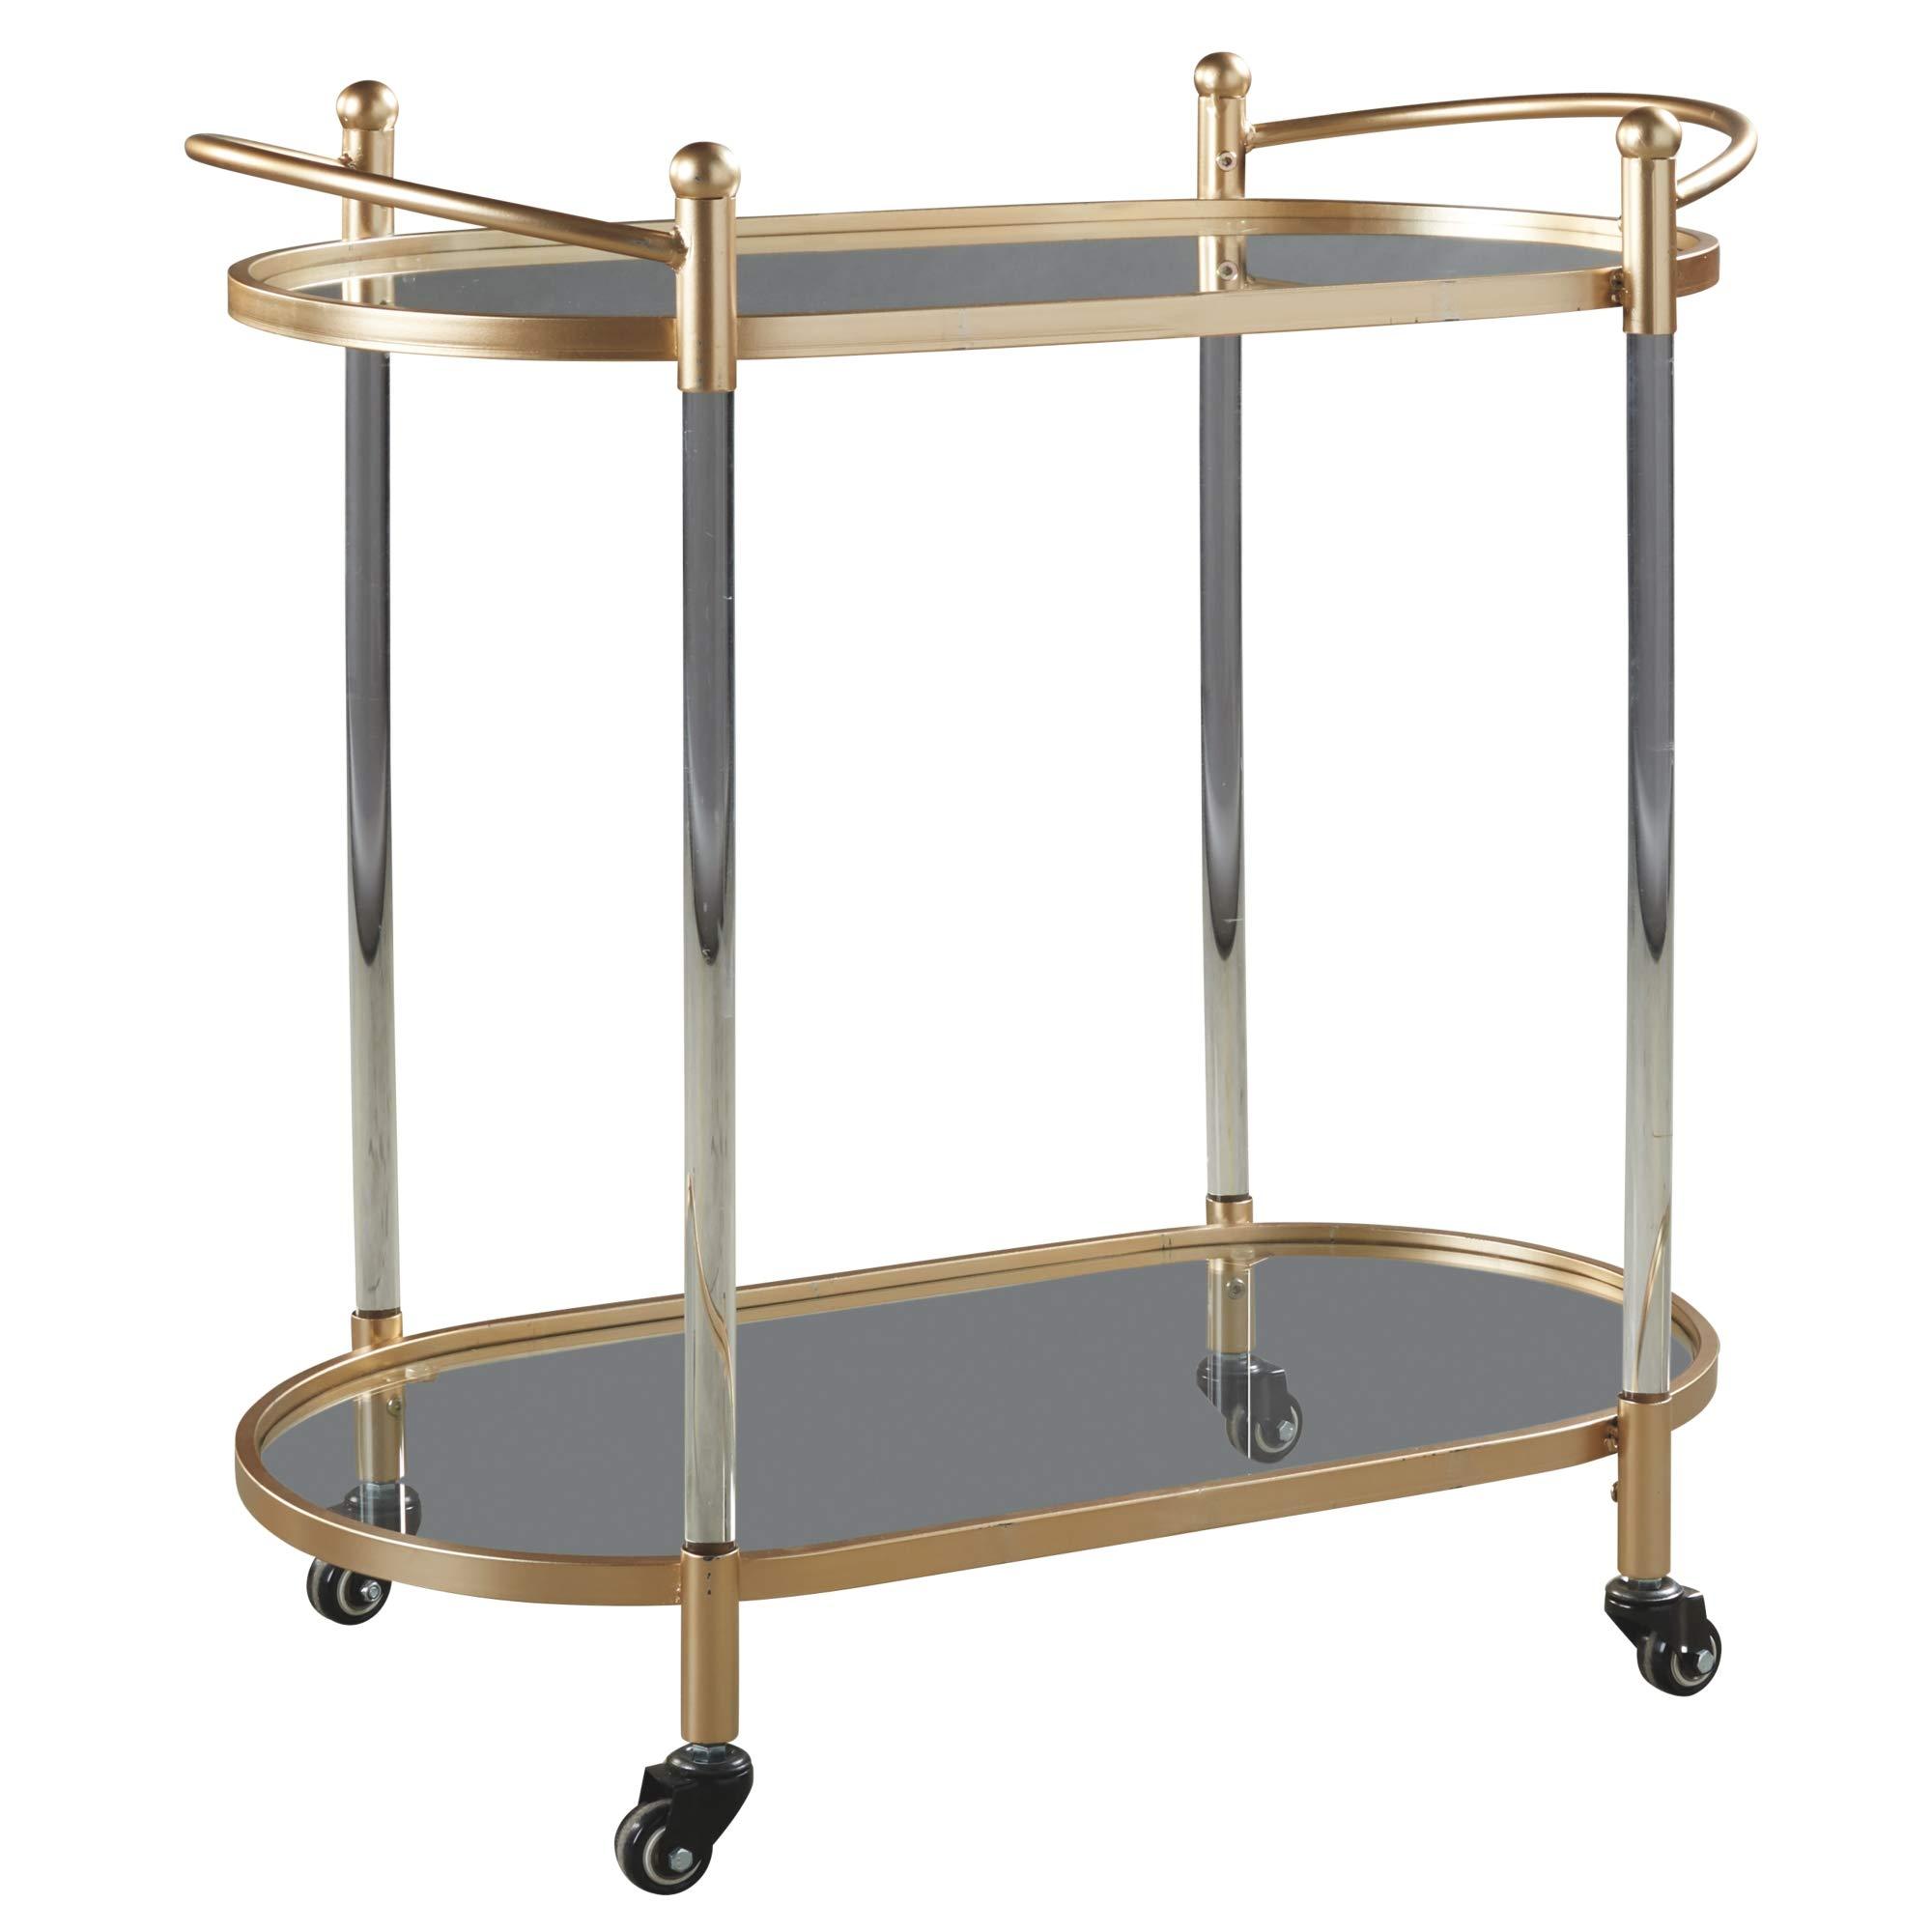 Signature Design by Ashley A4000103 Cordland Bar Cart, Clear/Gold Finish